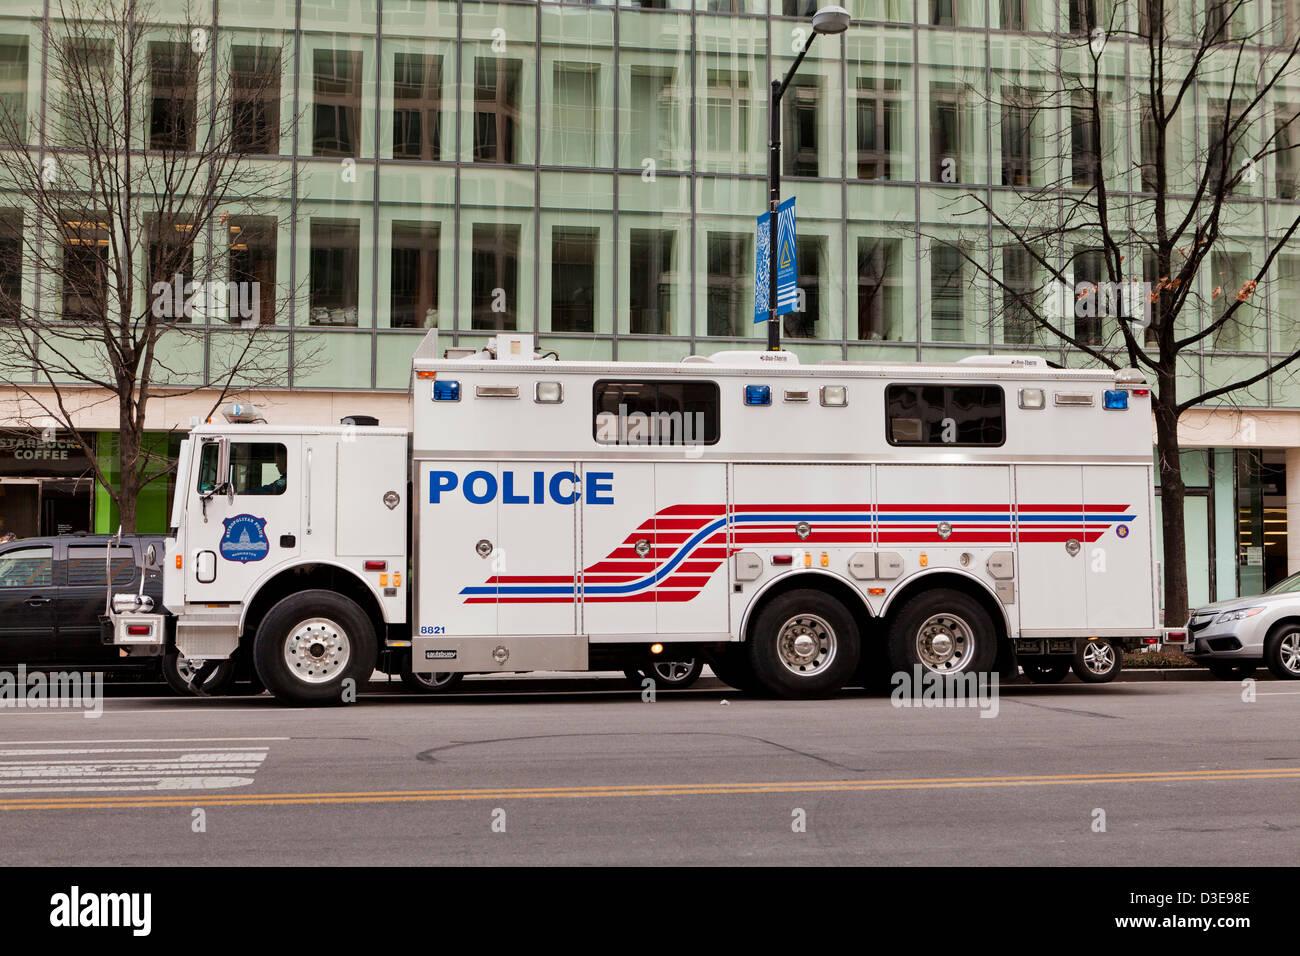 Police command center van - Washington, DC USA - Stock Image